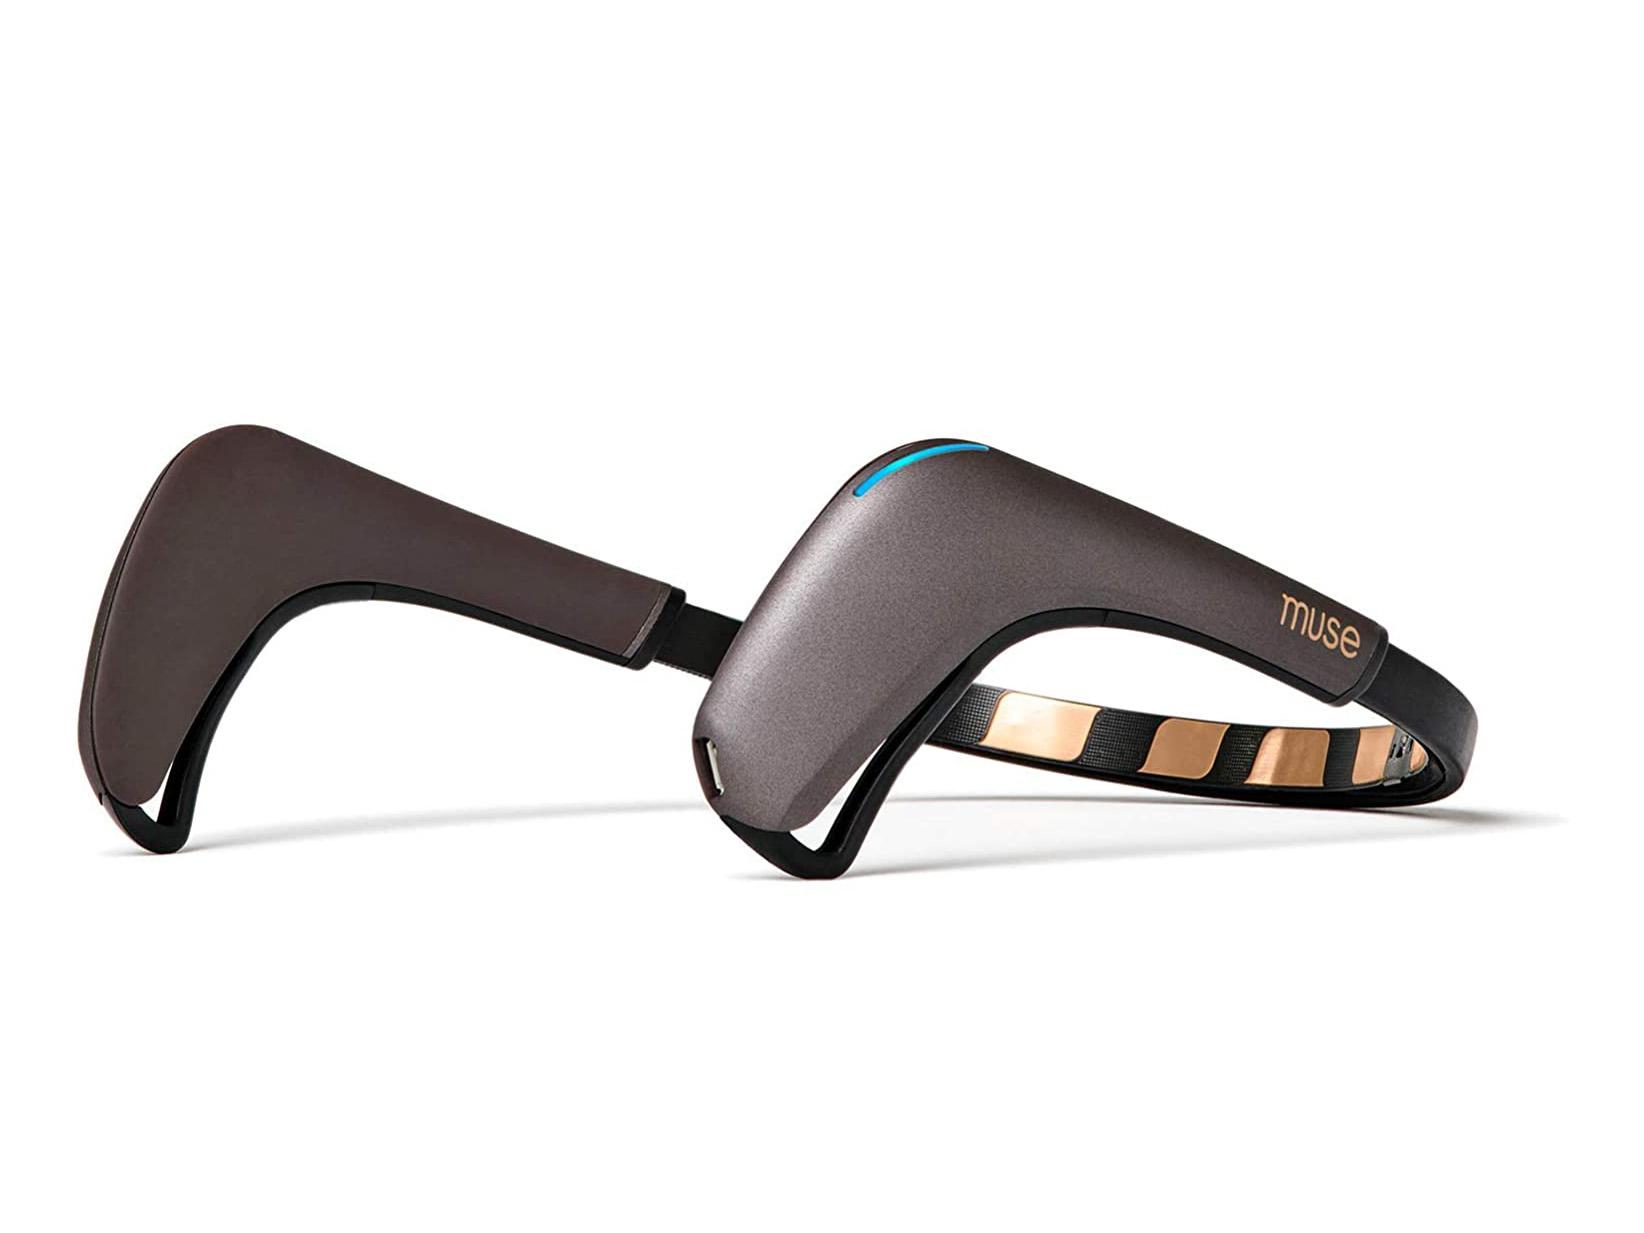 Best Meditation Products — Muse 2 Brain sensing headband